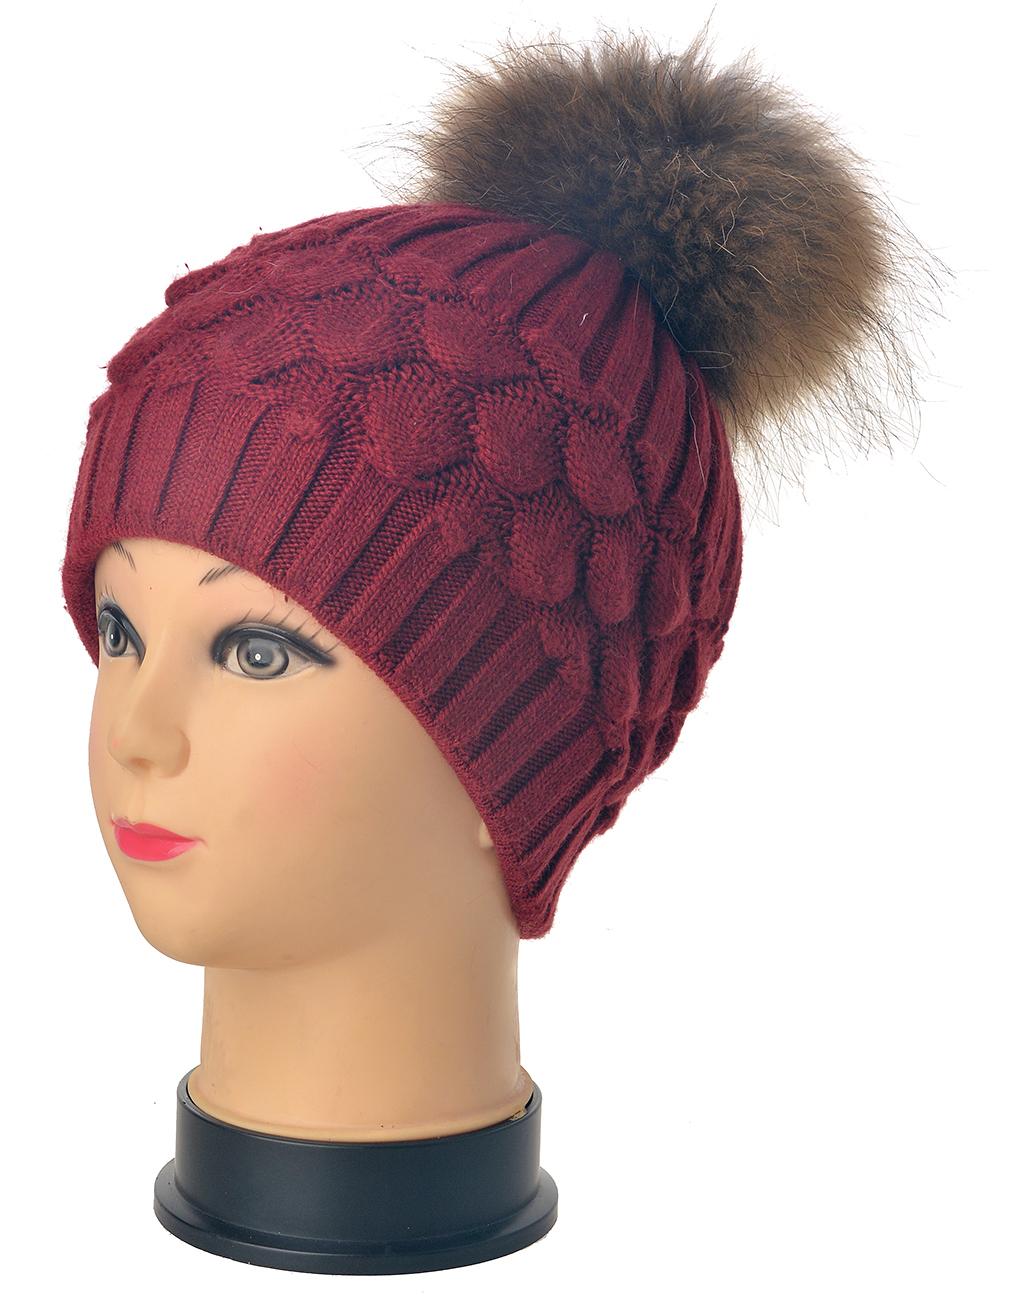 dc1d2b57b3396 Real Fur Pompom Beanie Hat Wholesale Price   Discount